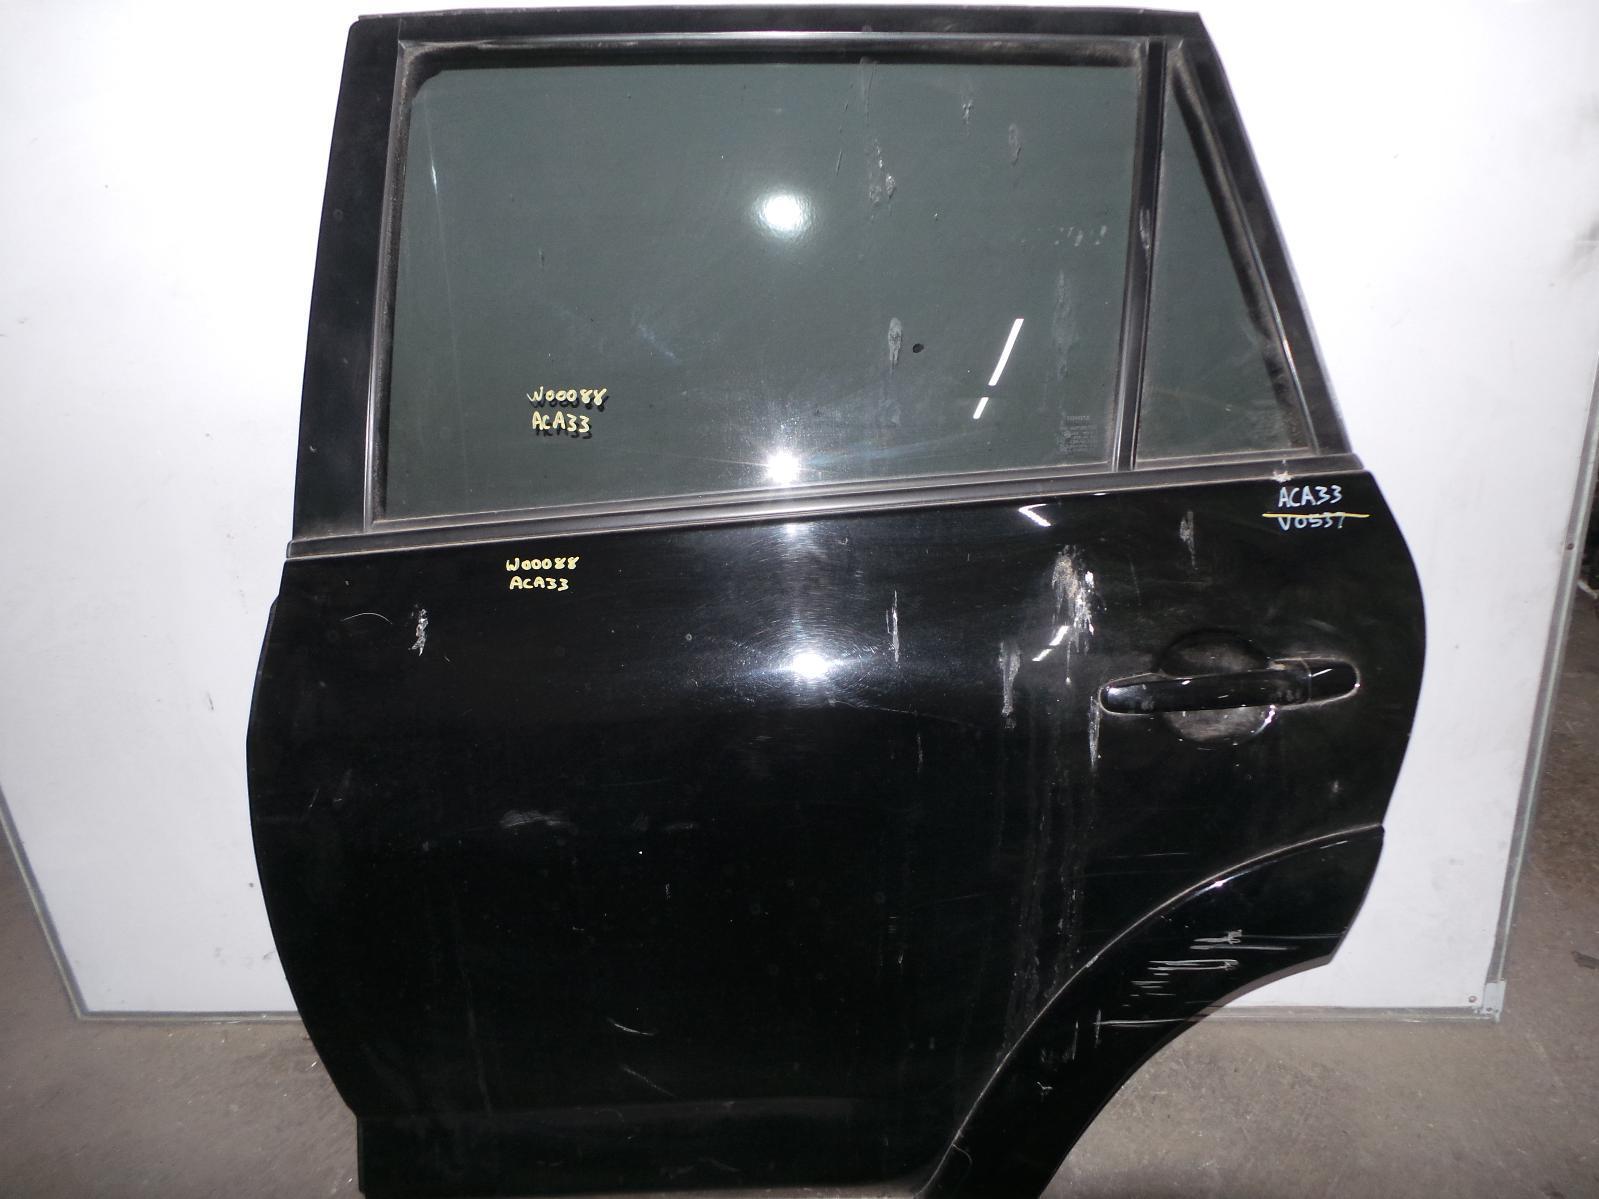 TOYOTA RAV4, Left Rear Door/Sliding, ACA33, CRUISER (FLARED TYPE), 01/06-12/12